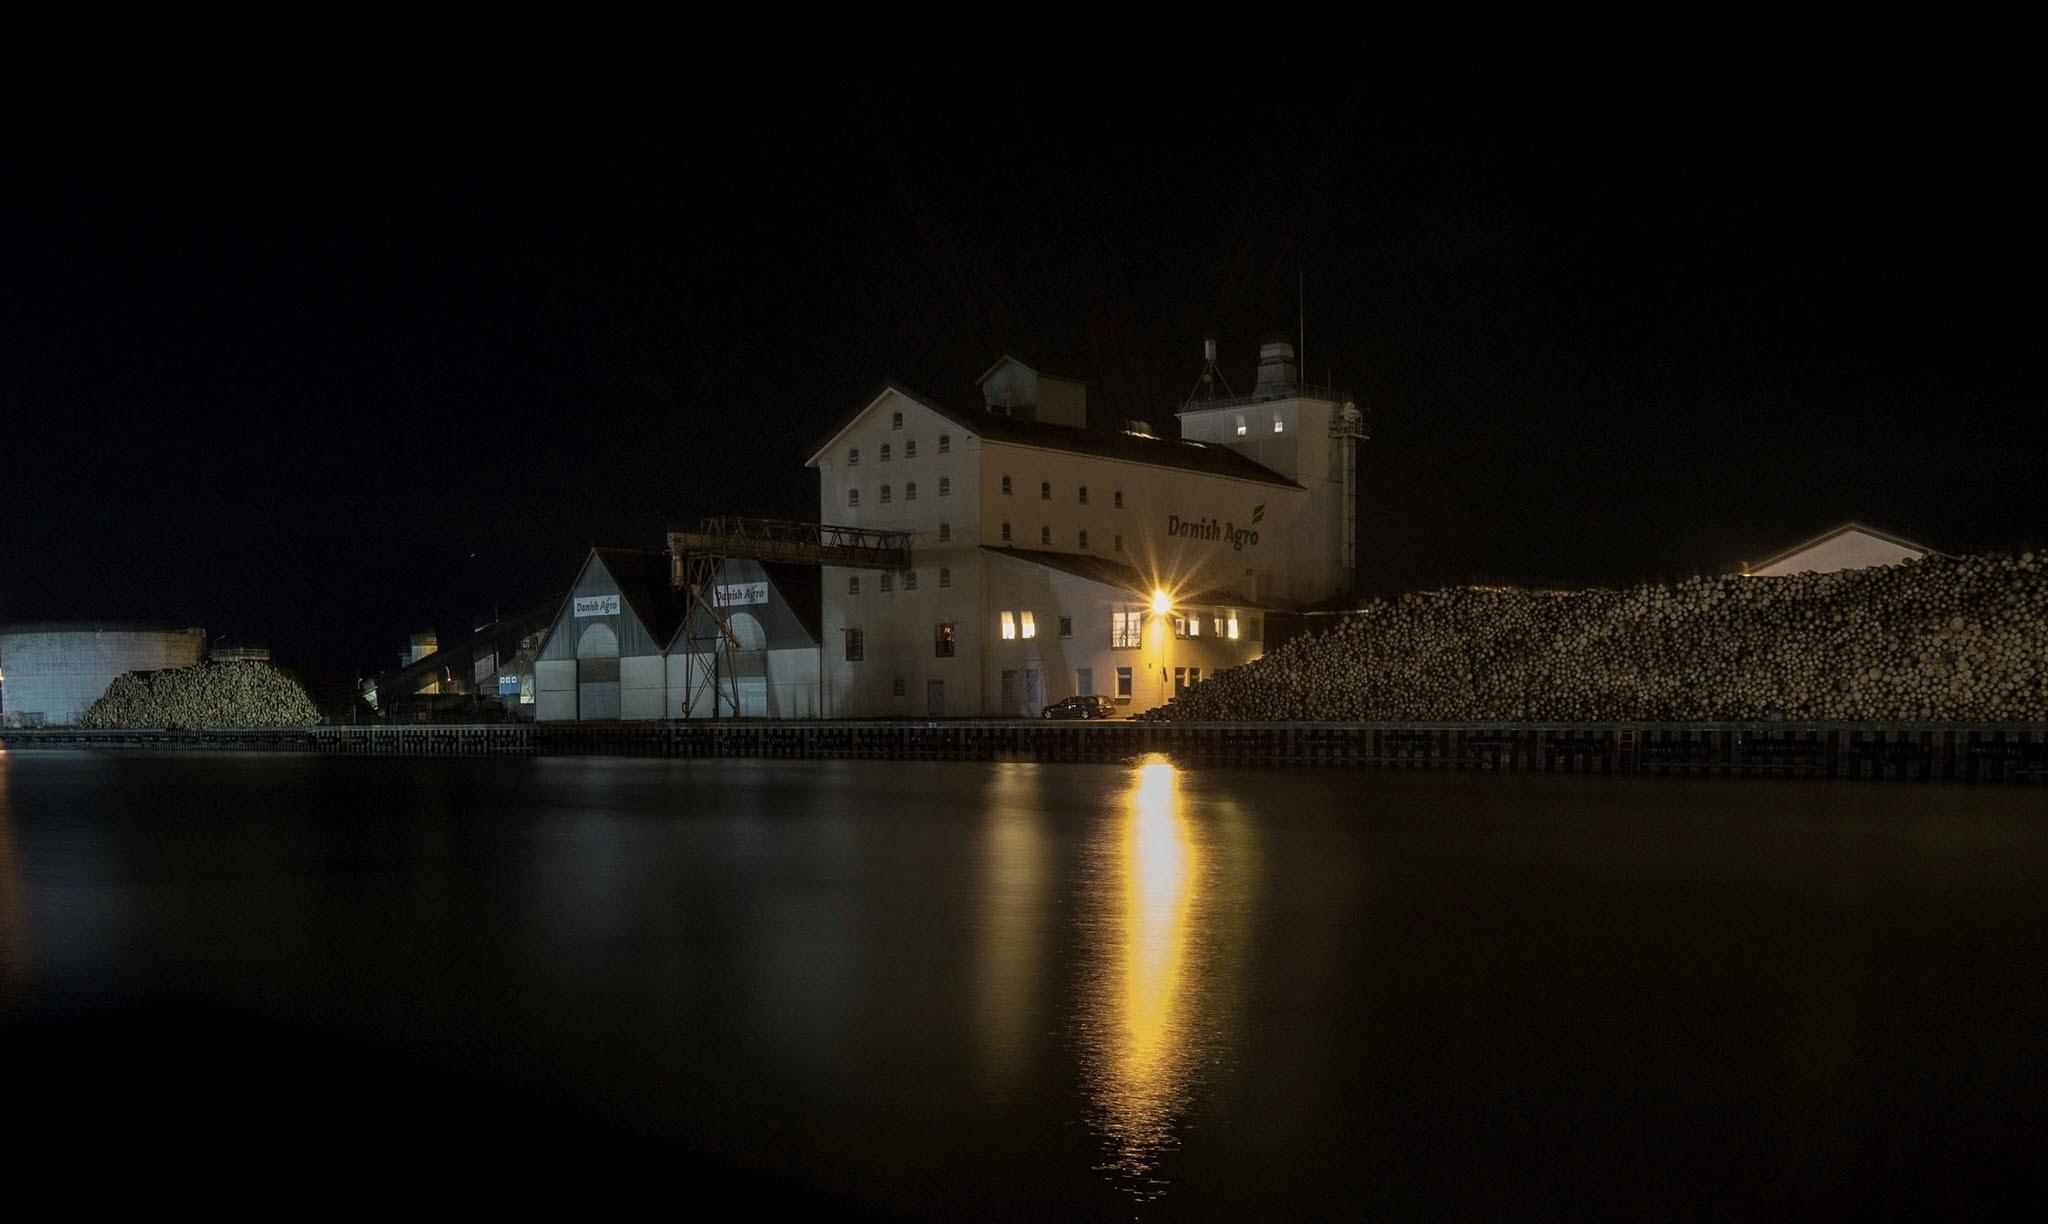 The Harbour by Dorte Hedengran